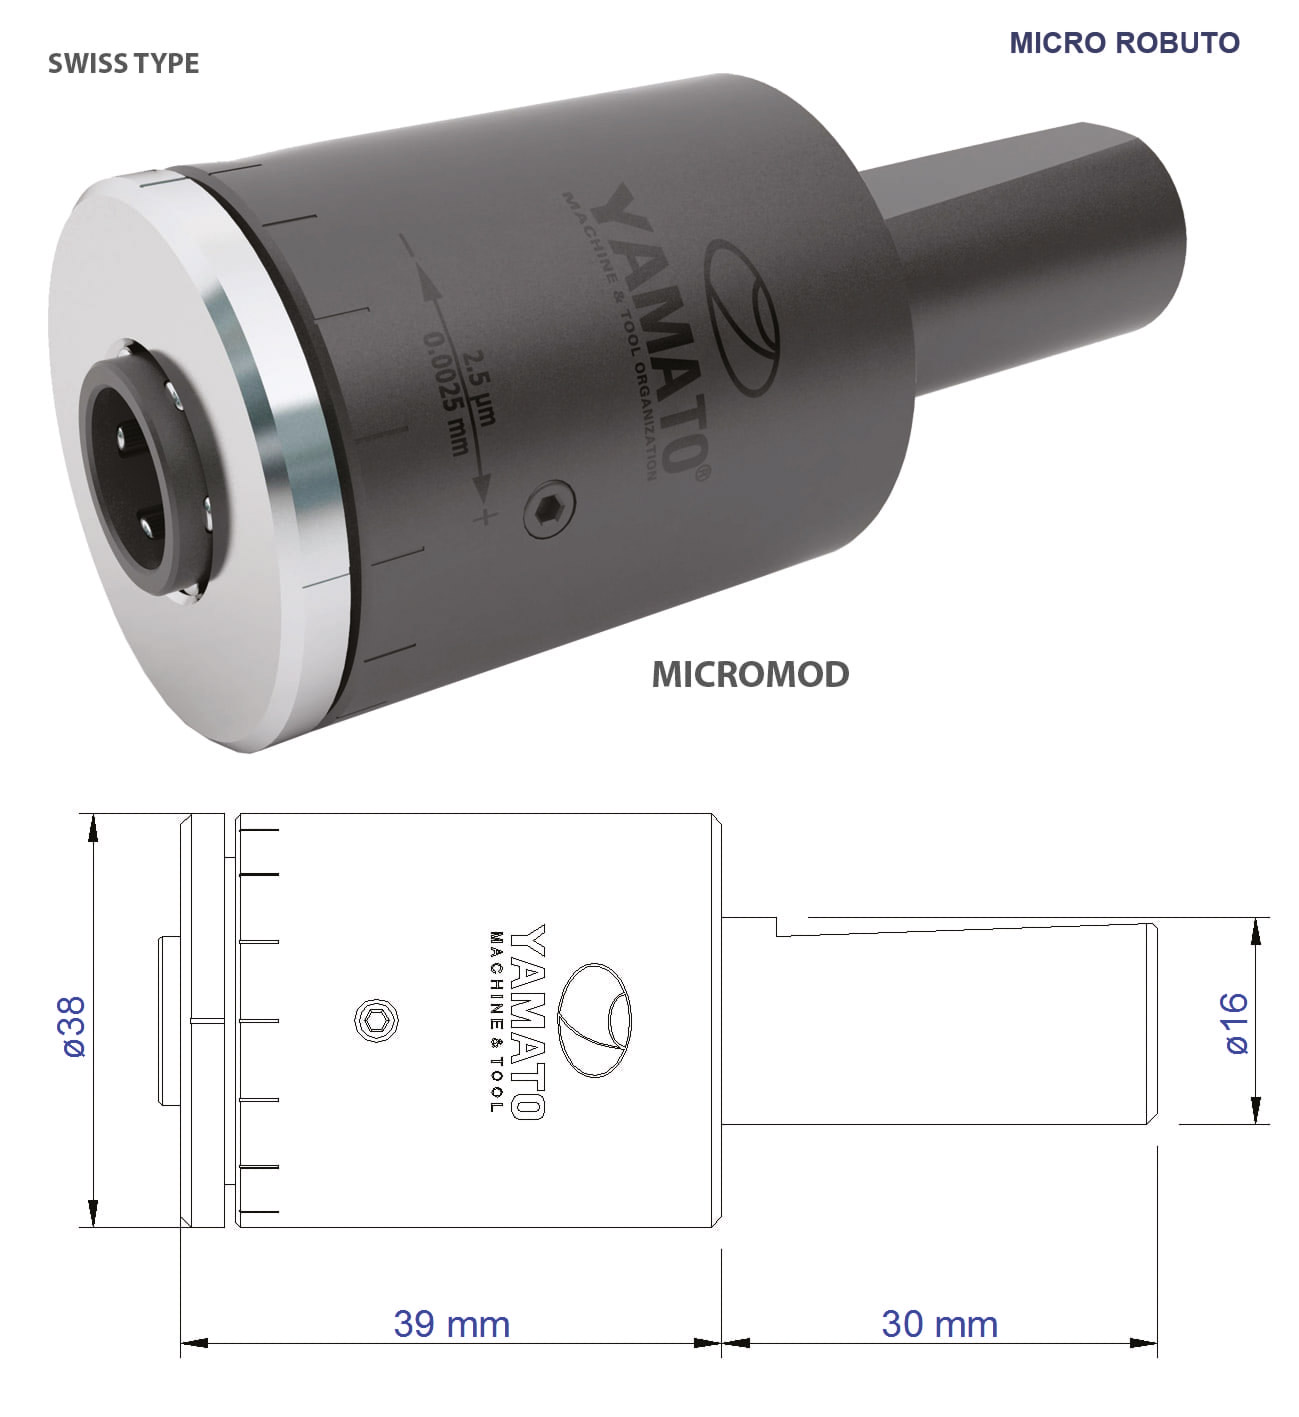 MICROMOD - Swiss Type External Robuto